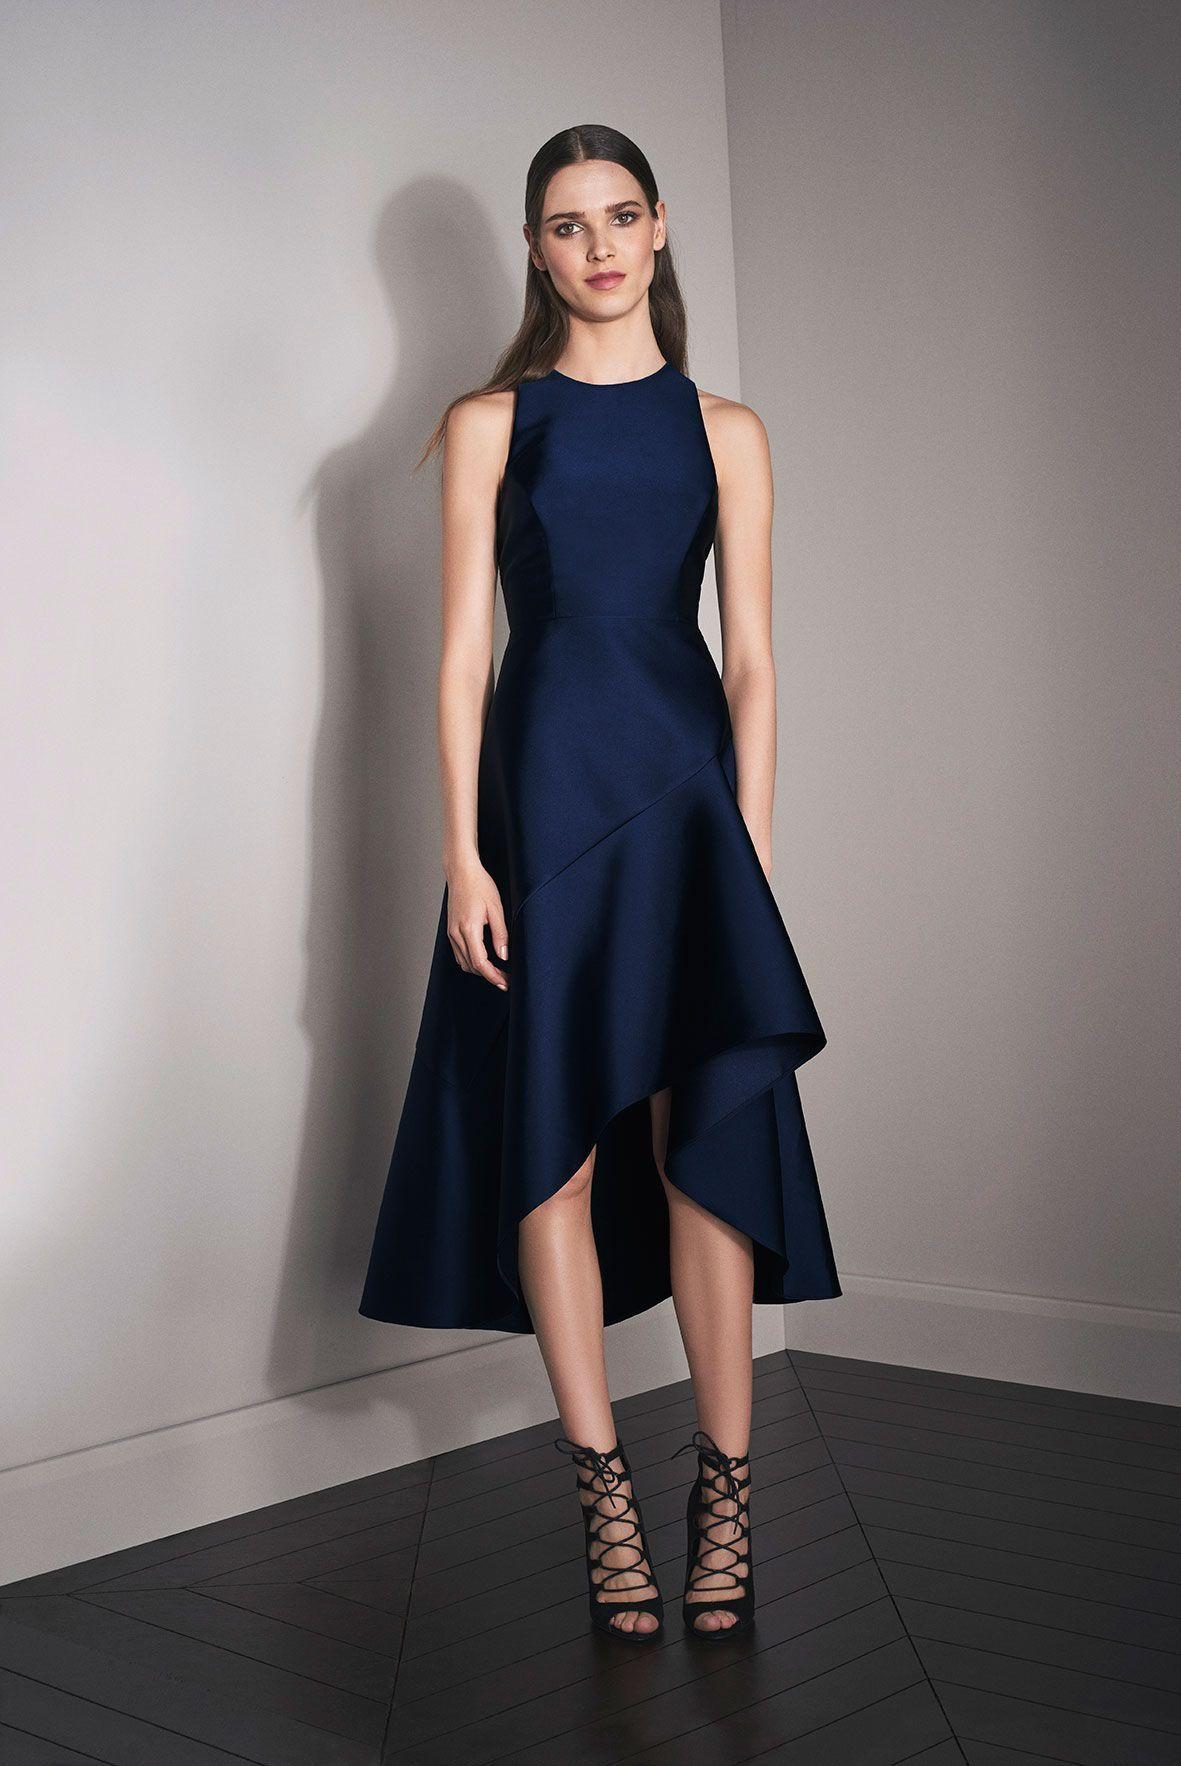 Satin Fashion Dresses